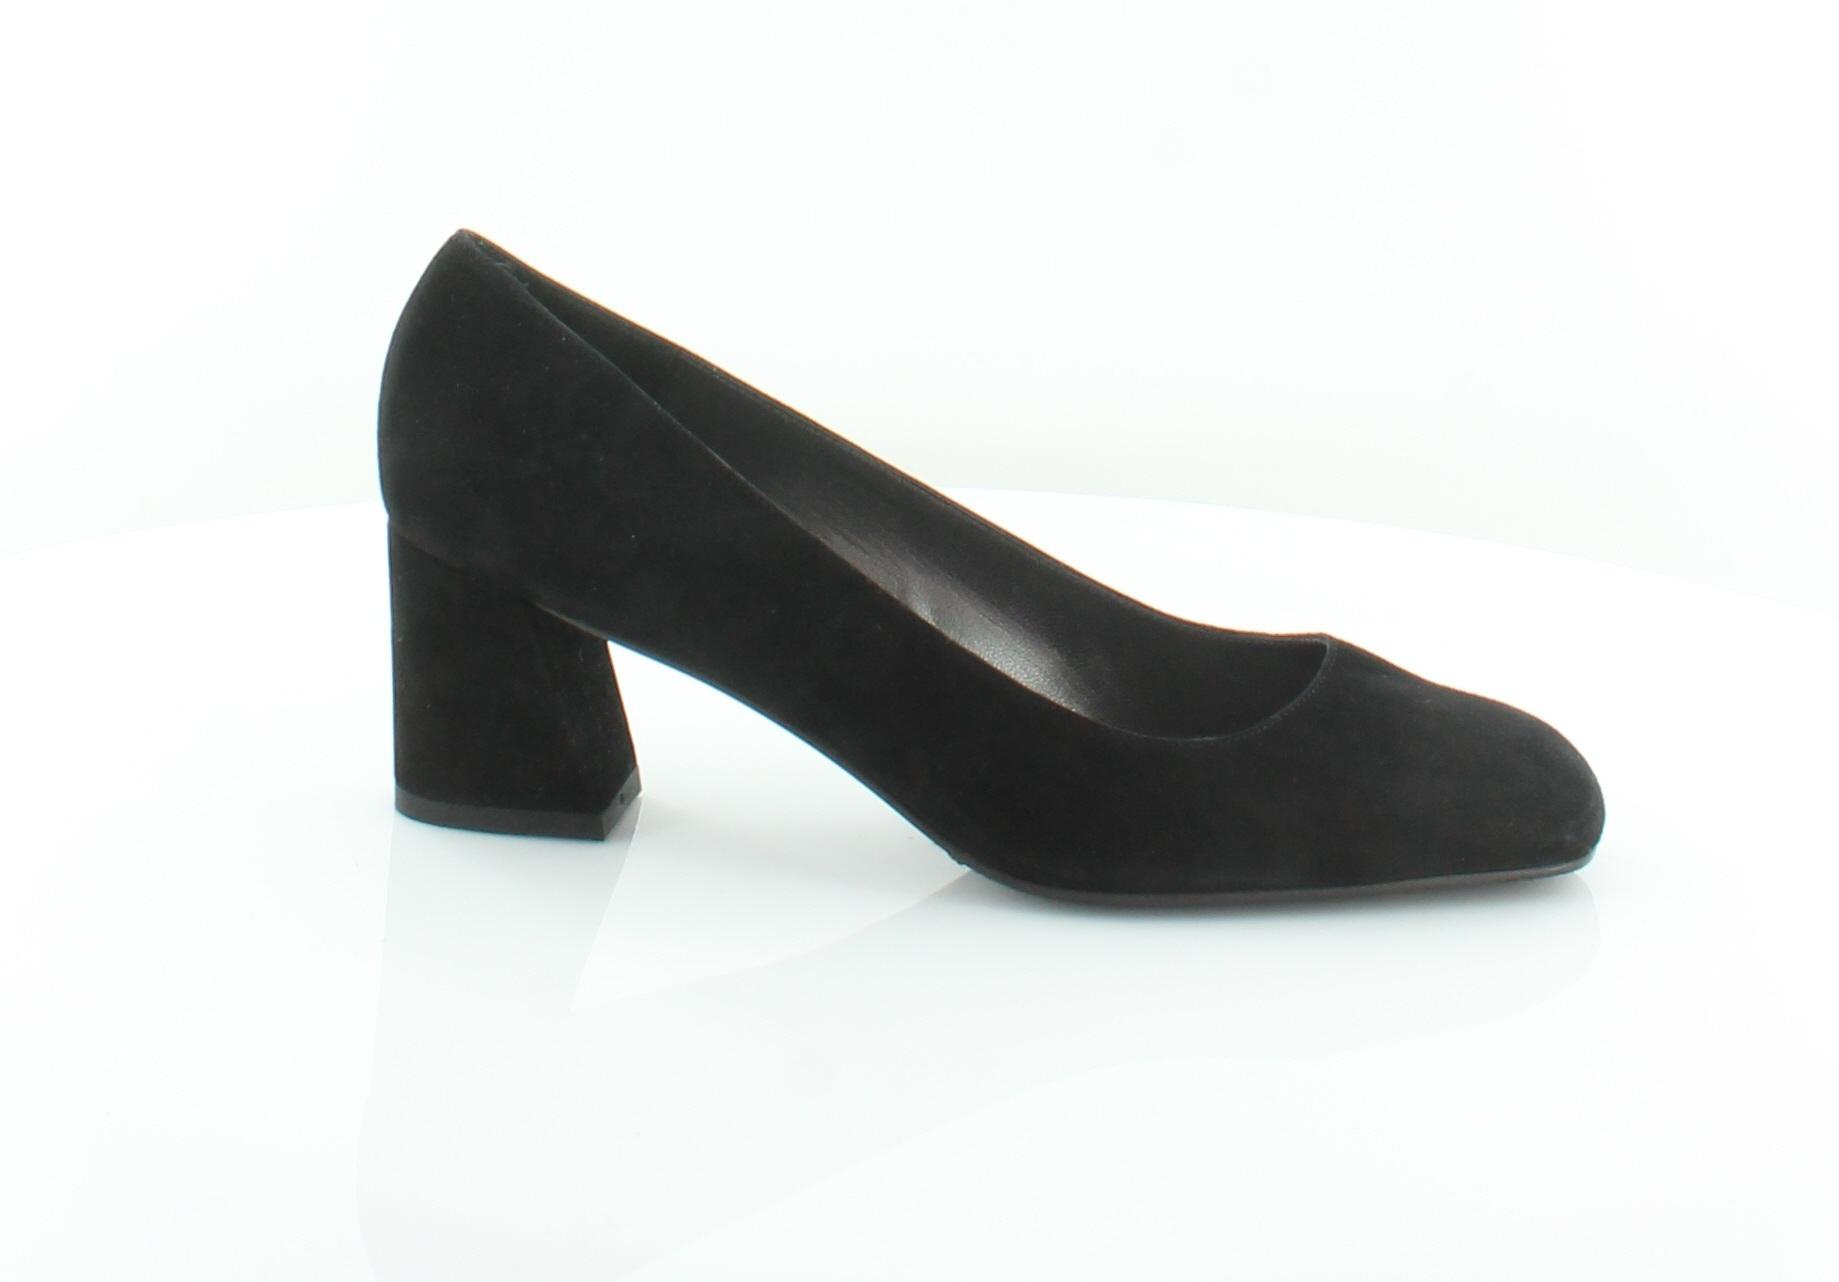 più economico Stuart Stuart Stuart Weitzman Marymid nero donna scarpe Dimensione 8.5 M Heels MSRP  375  vendita calda online